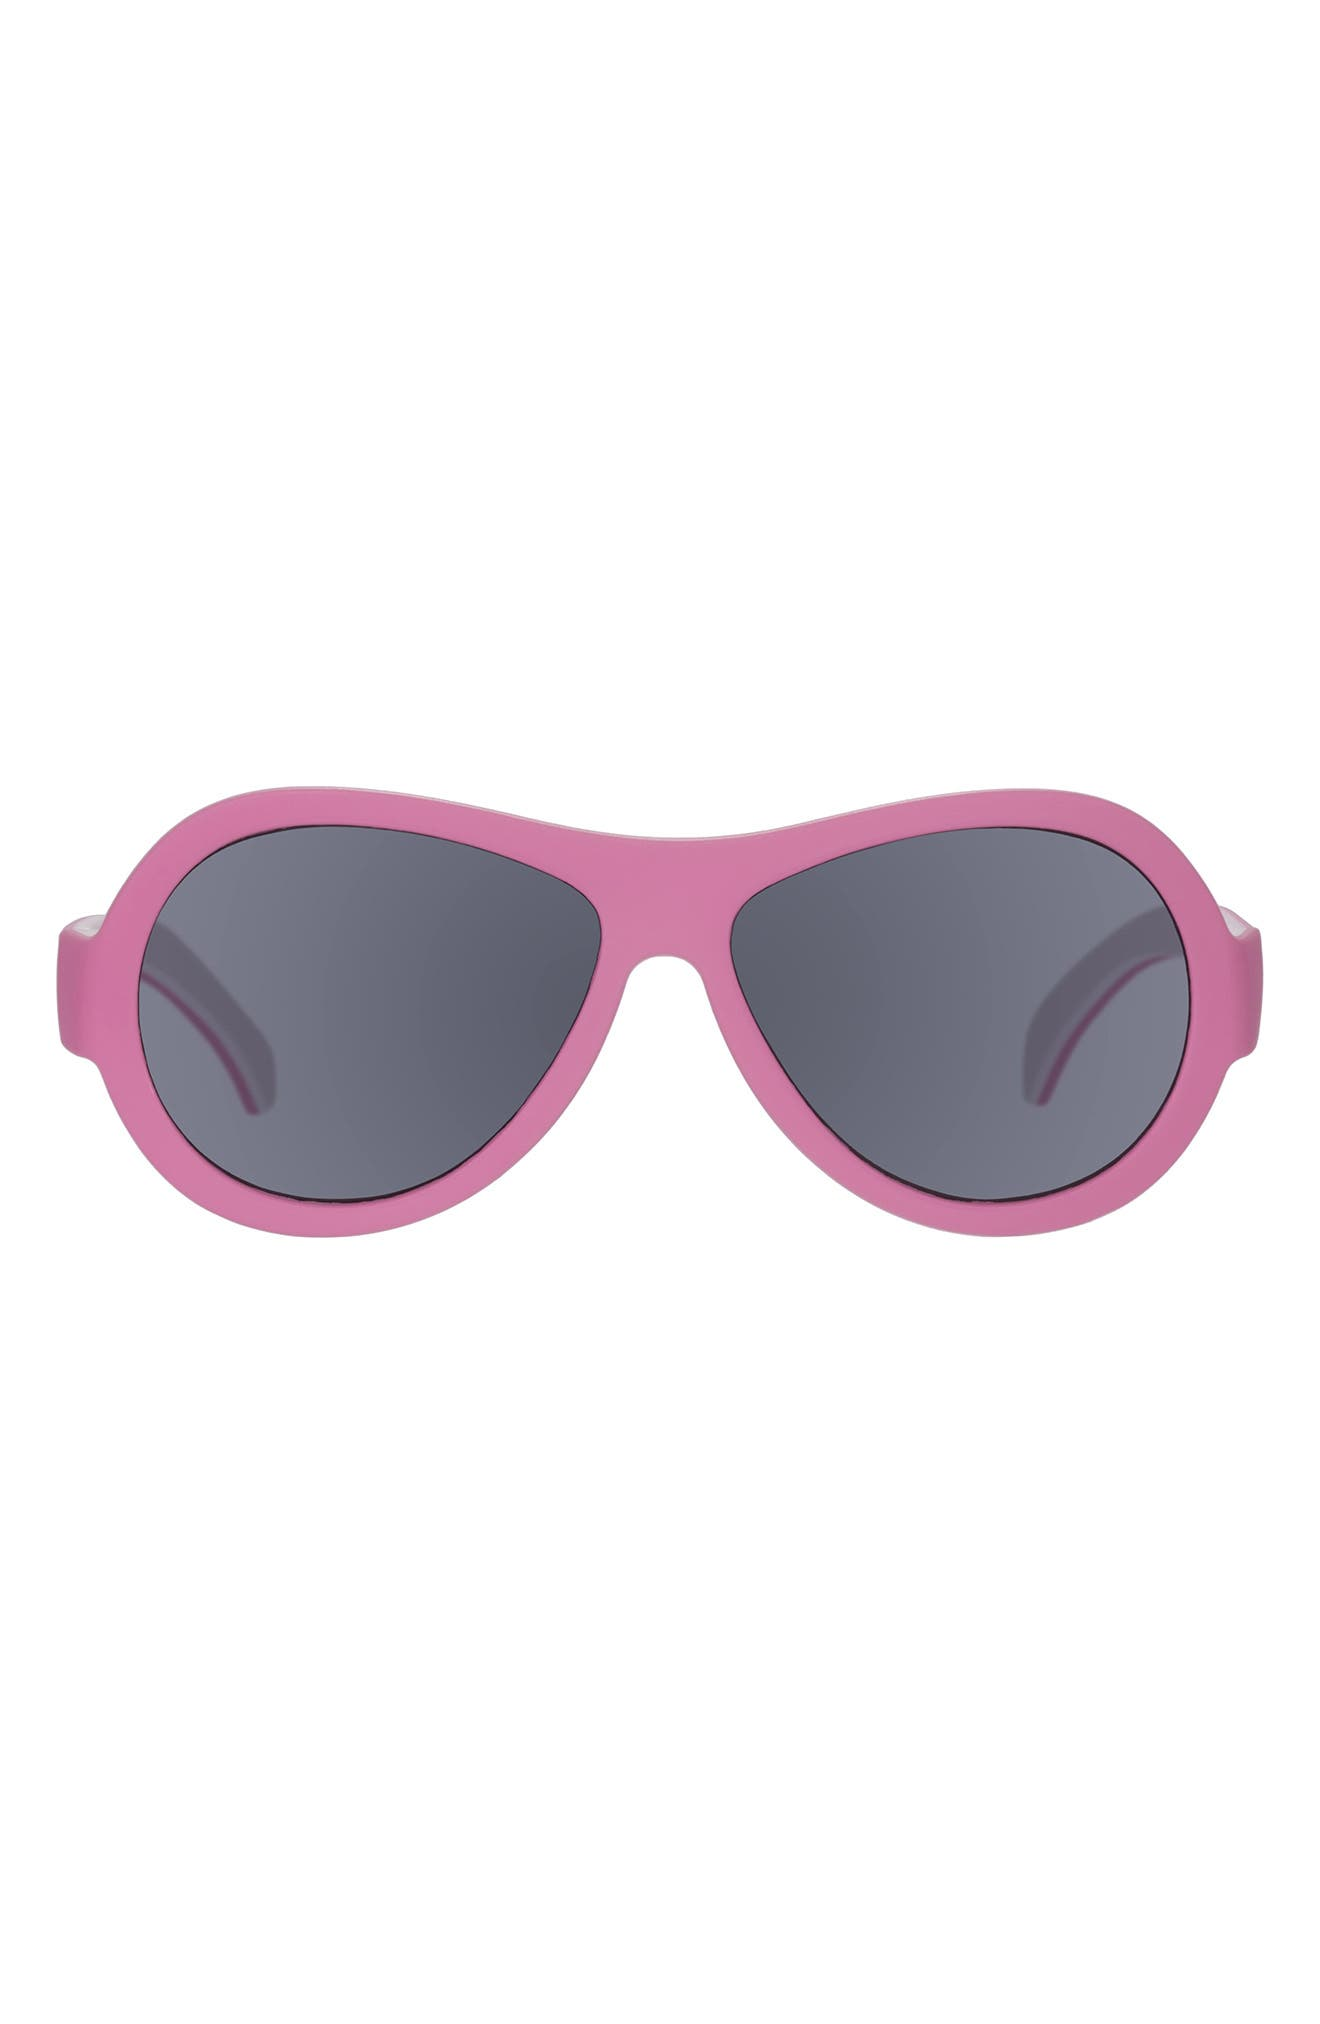 Child Size Girly Unicorn Jewel Badge Trim Pilots Sunglasses